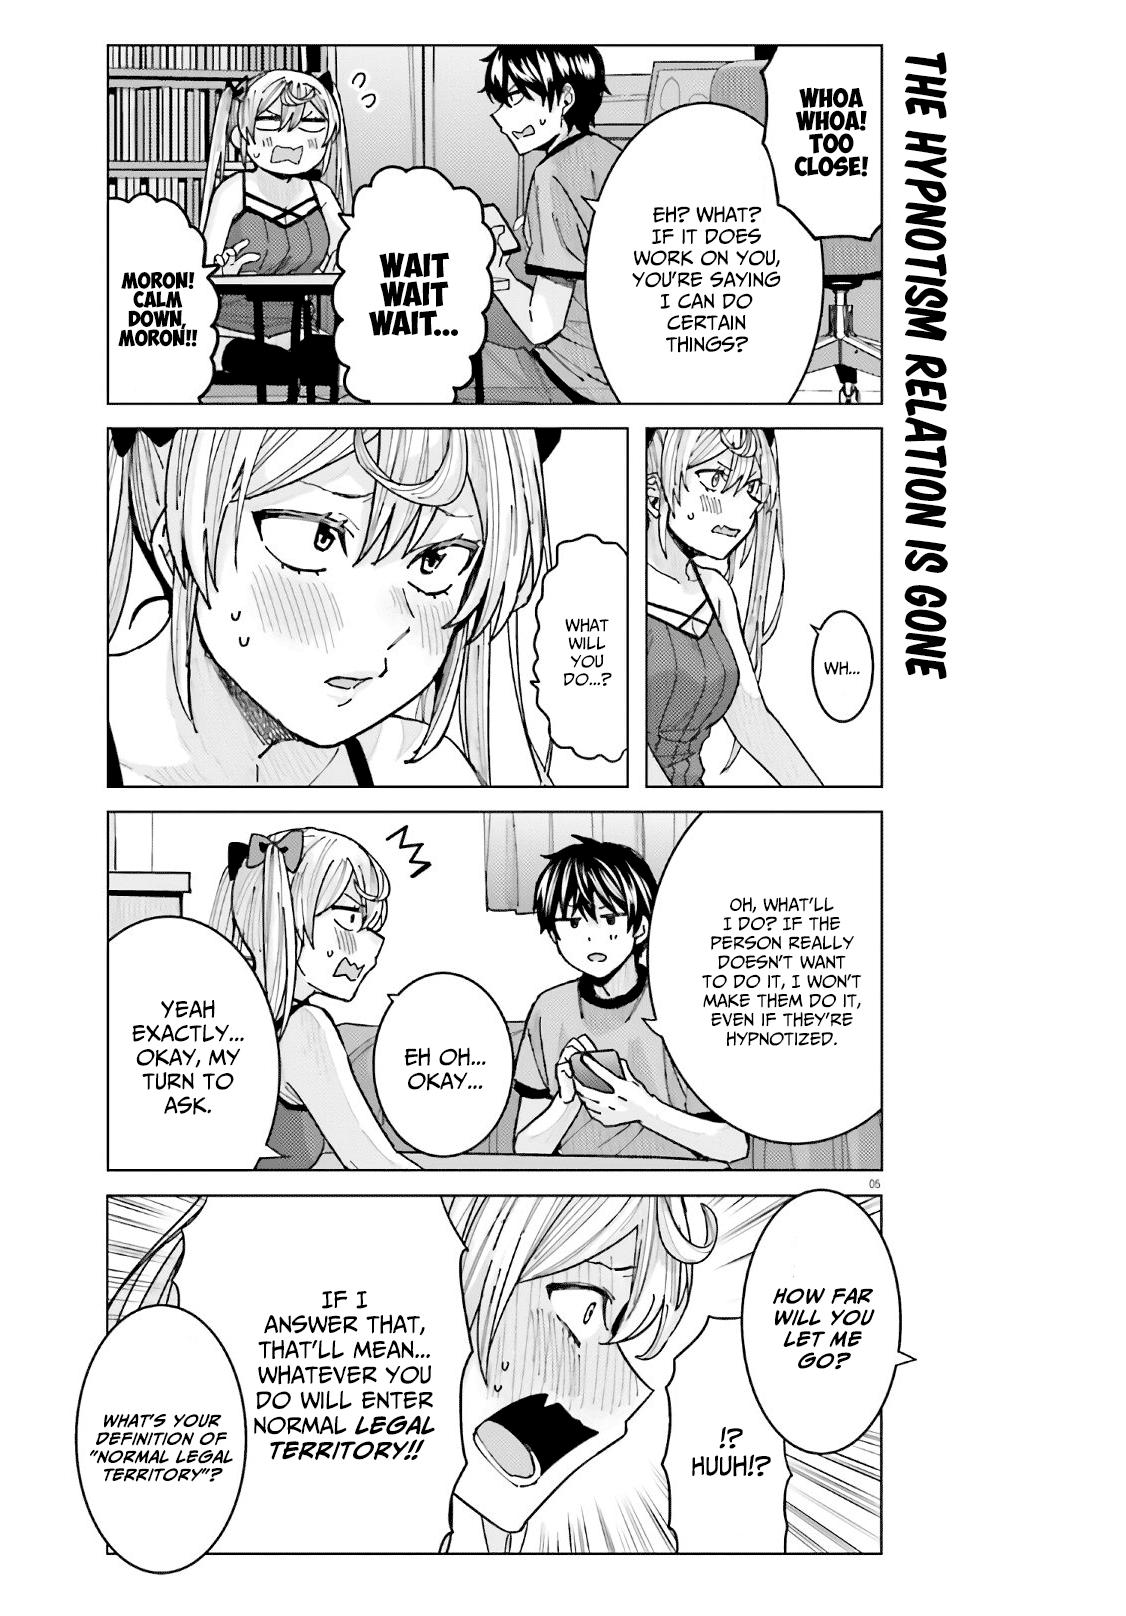 Himegasaki Sakurako Wa Kyoumo Fubin Kawaii! Chapter 13 page 5 - Mangakakalots.com